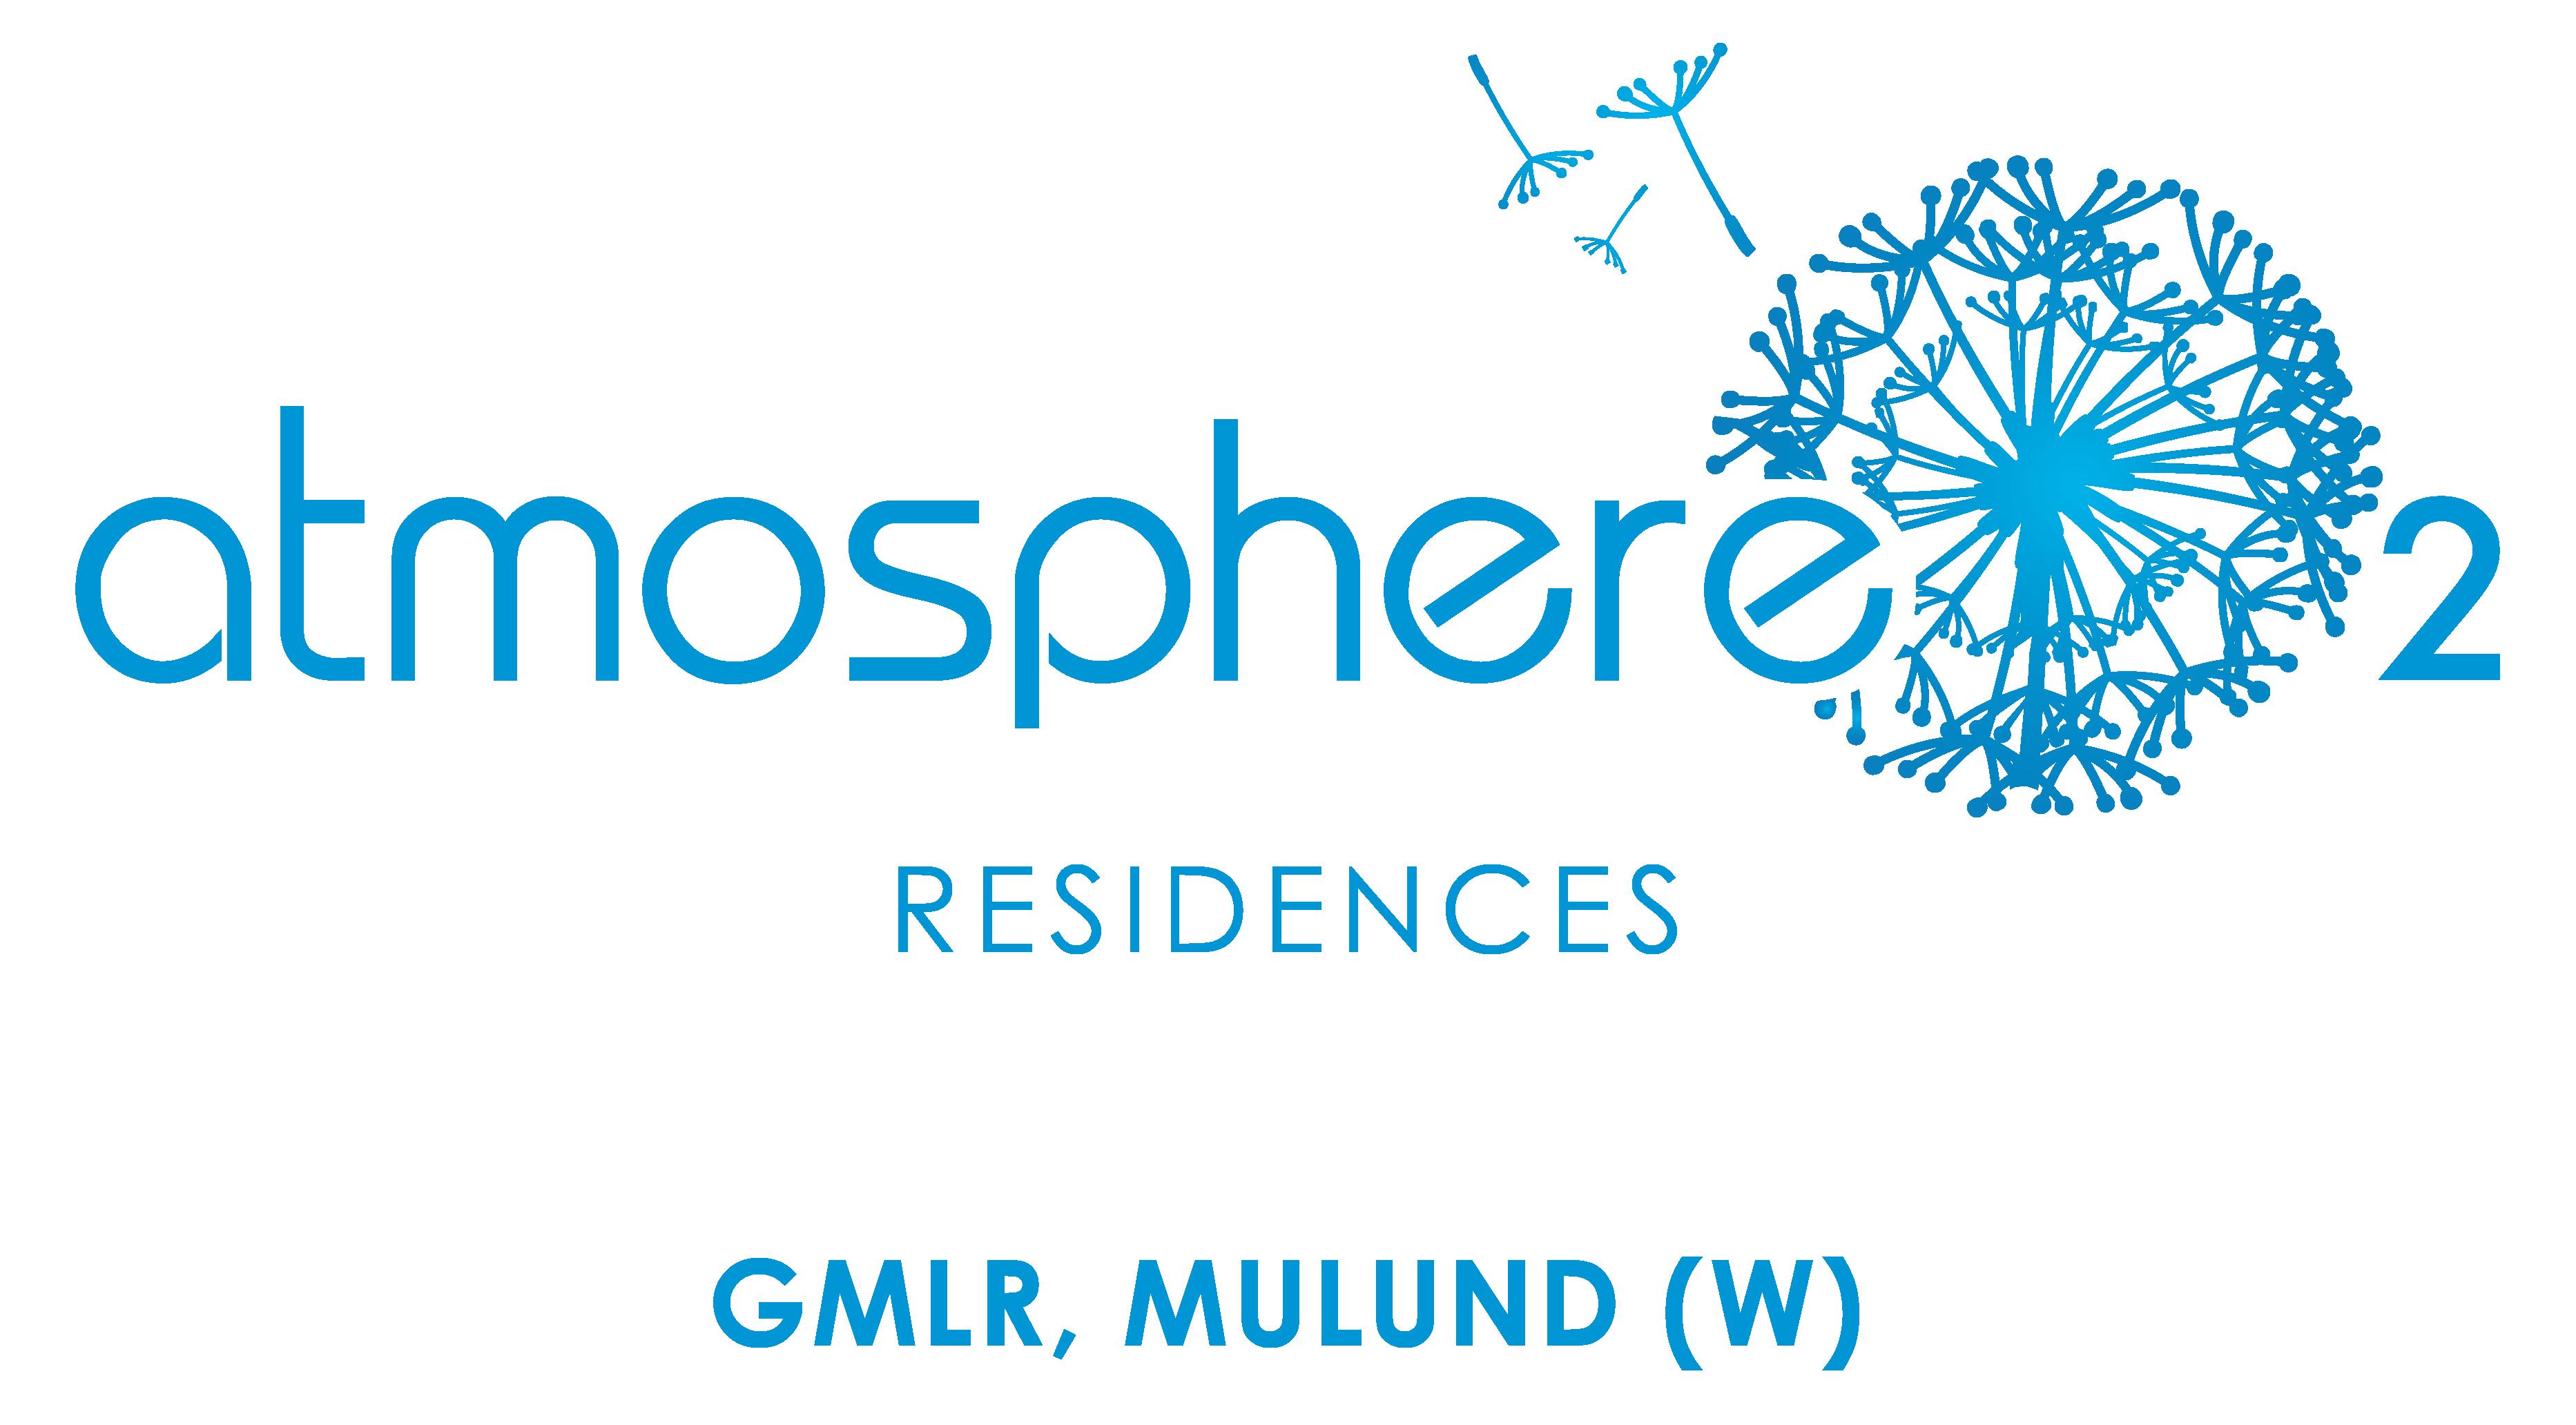 Atmosphere O2 Central Mumbai suburbs